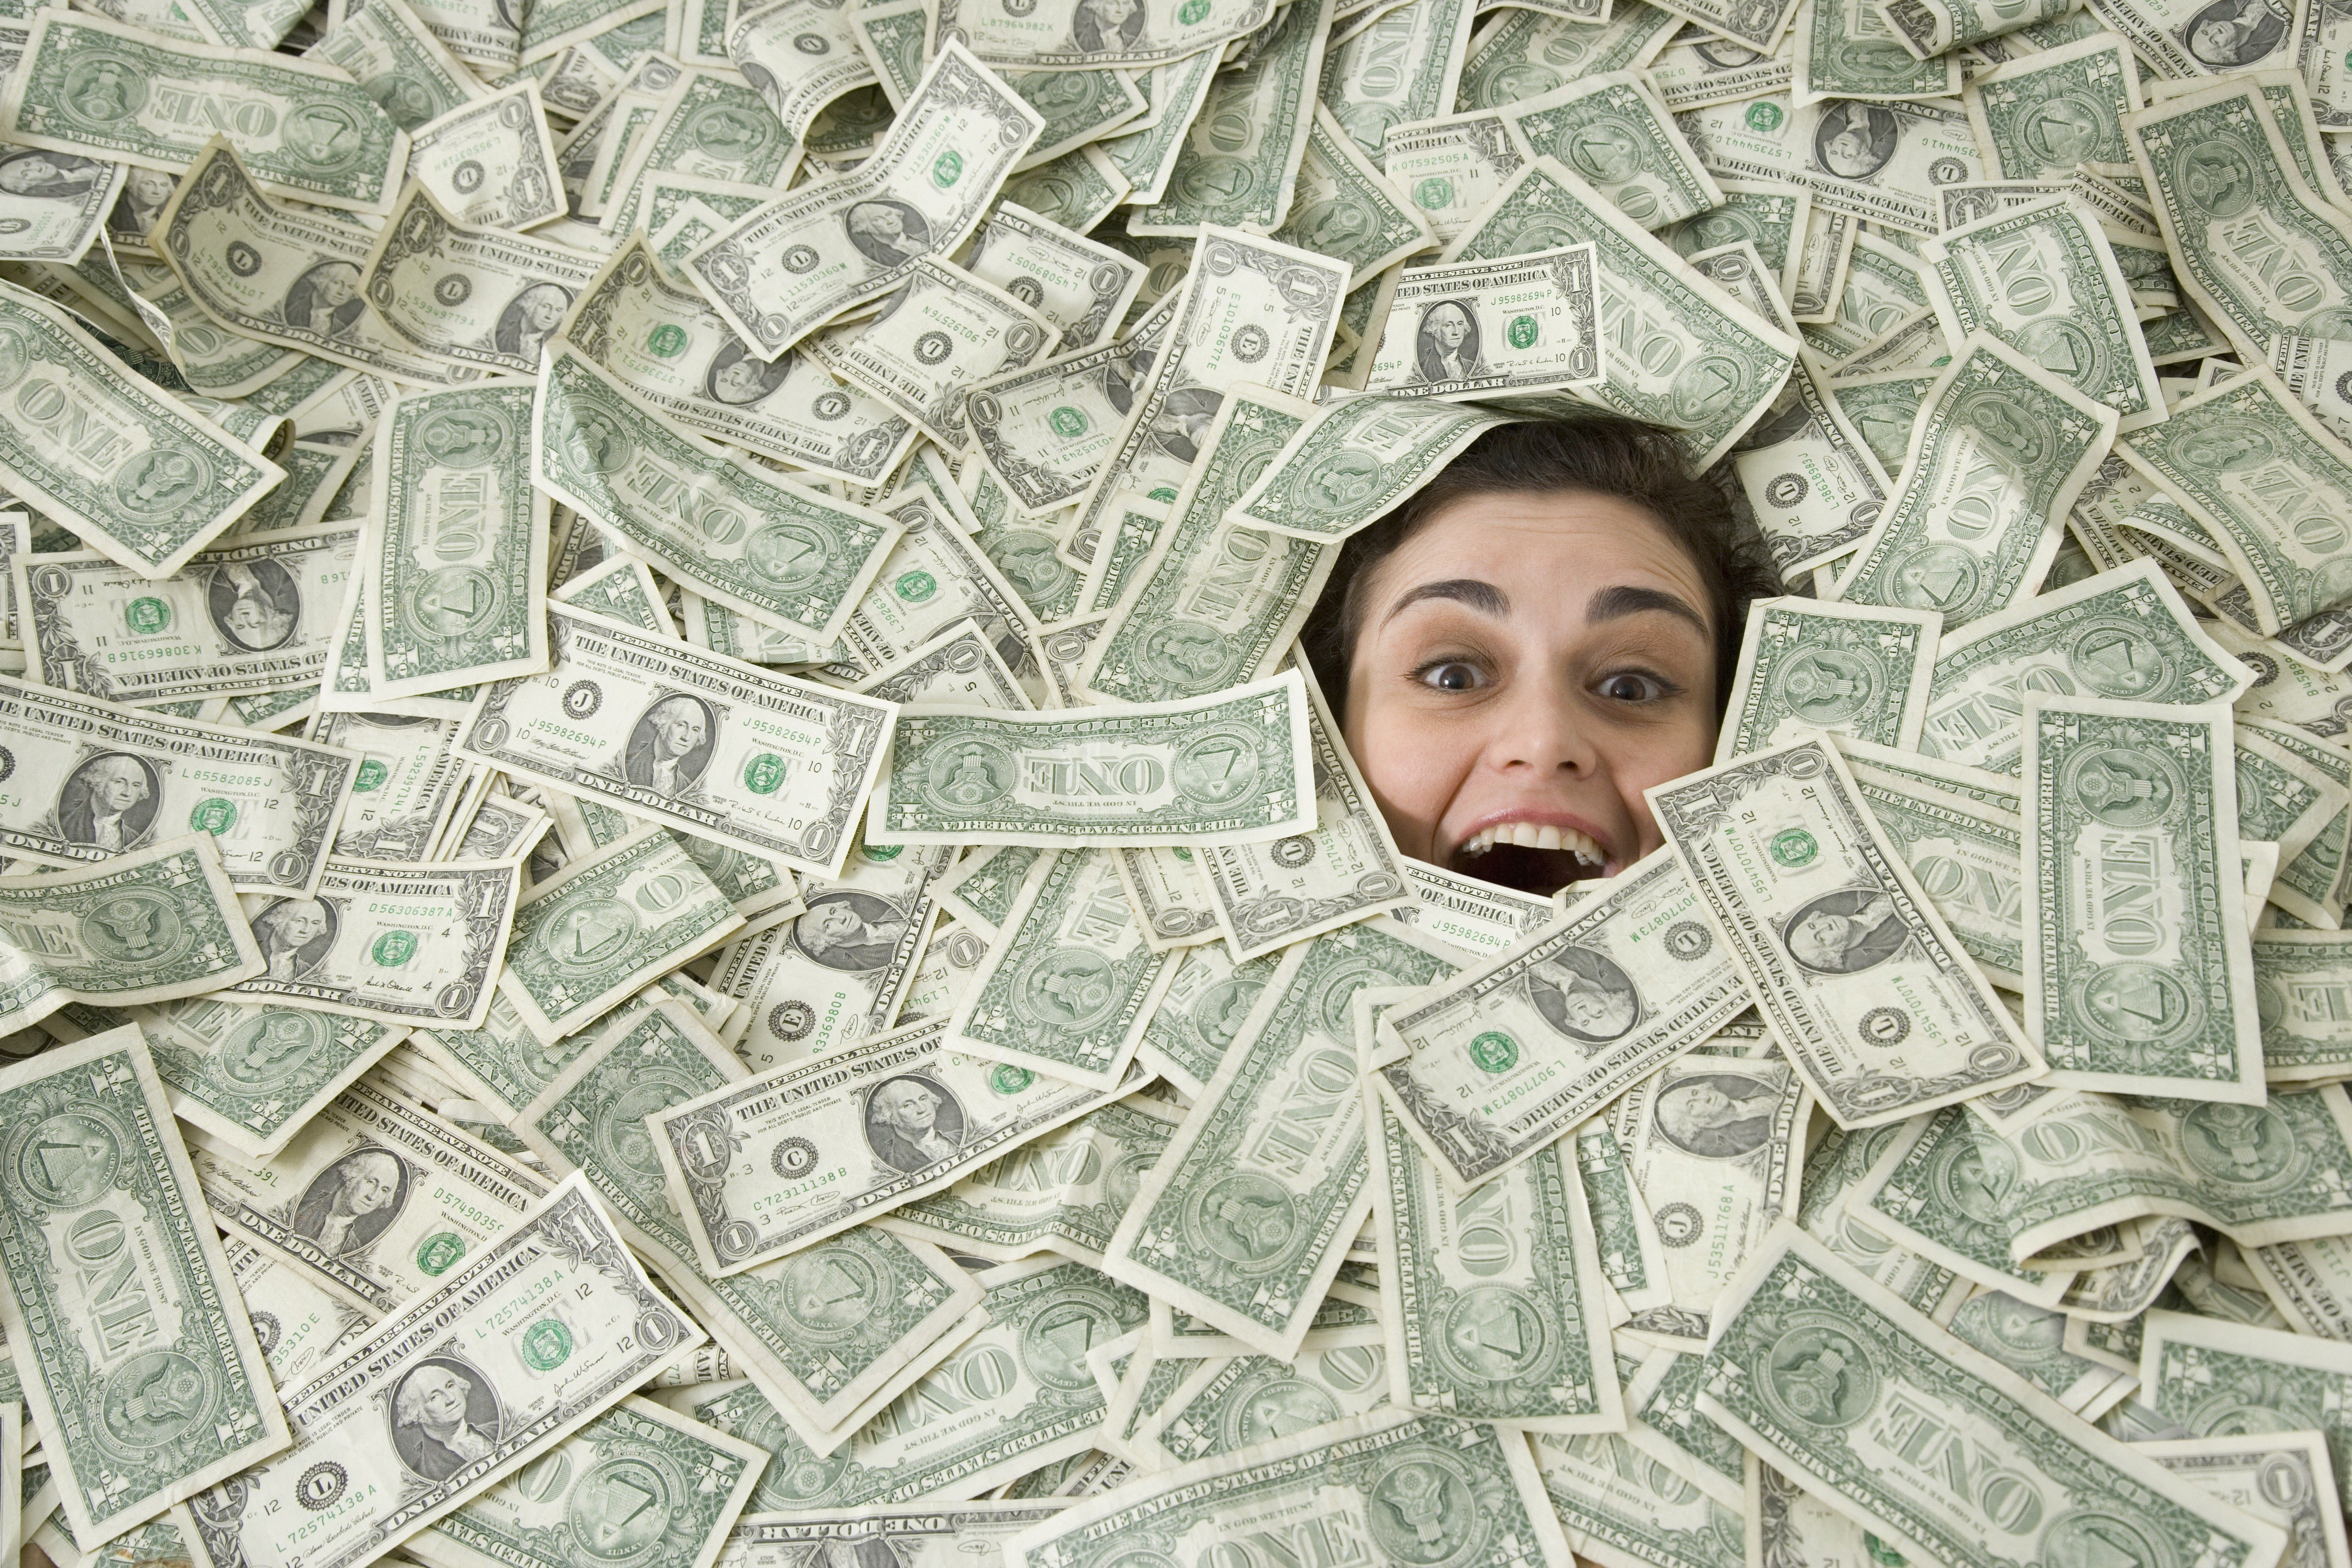 Cash advance new philadelphia image 10